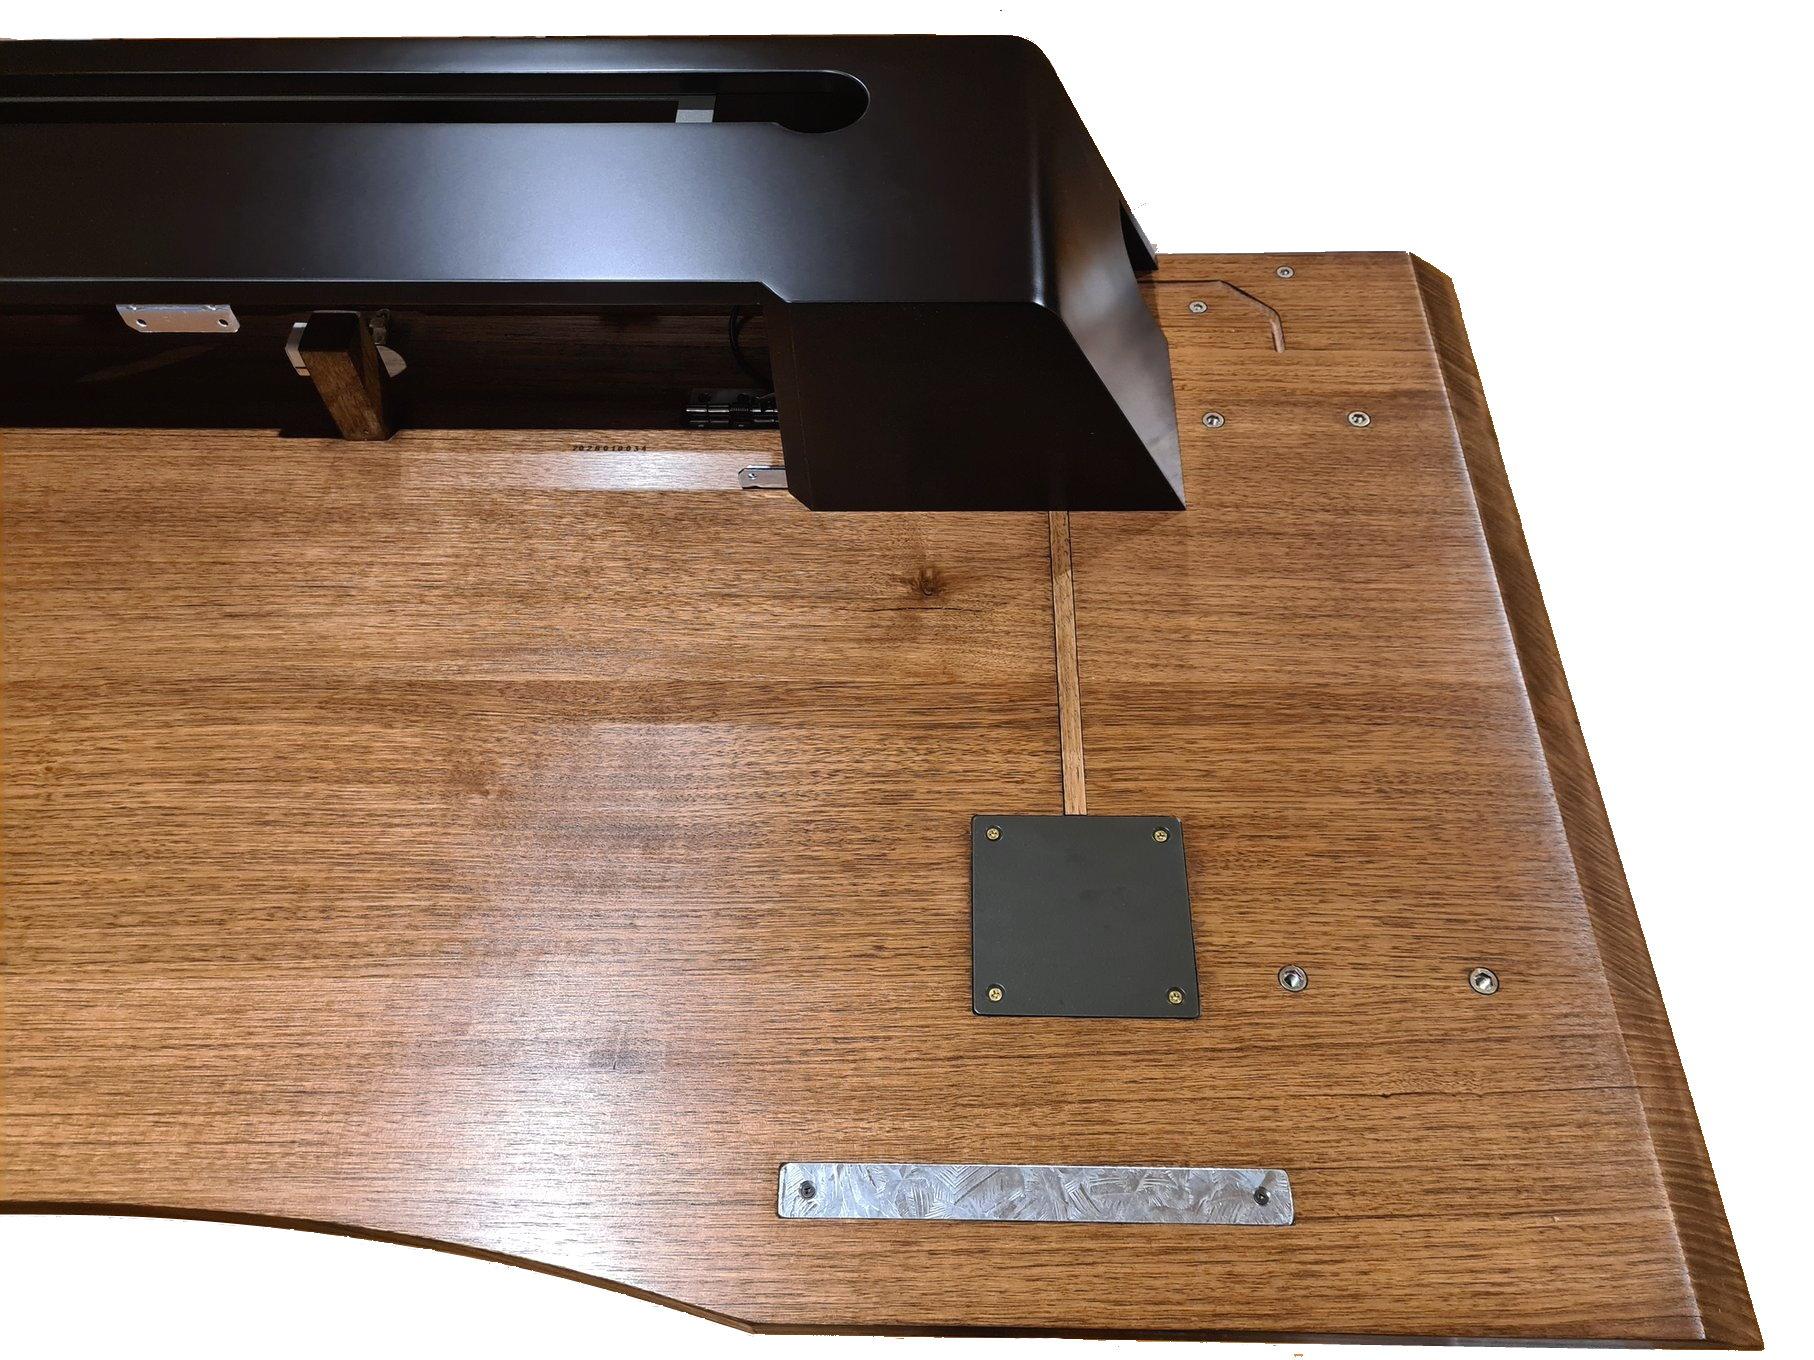 Table top underside